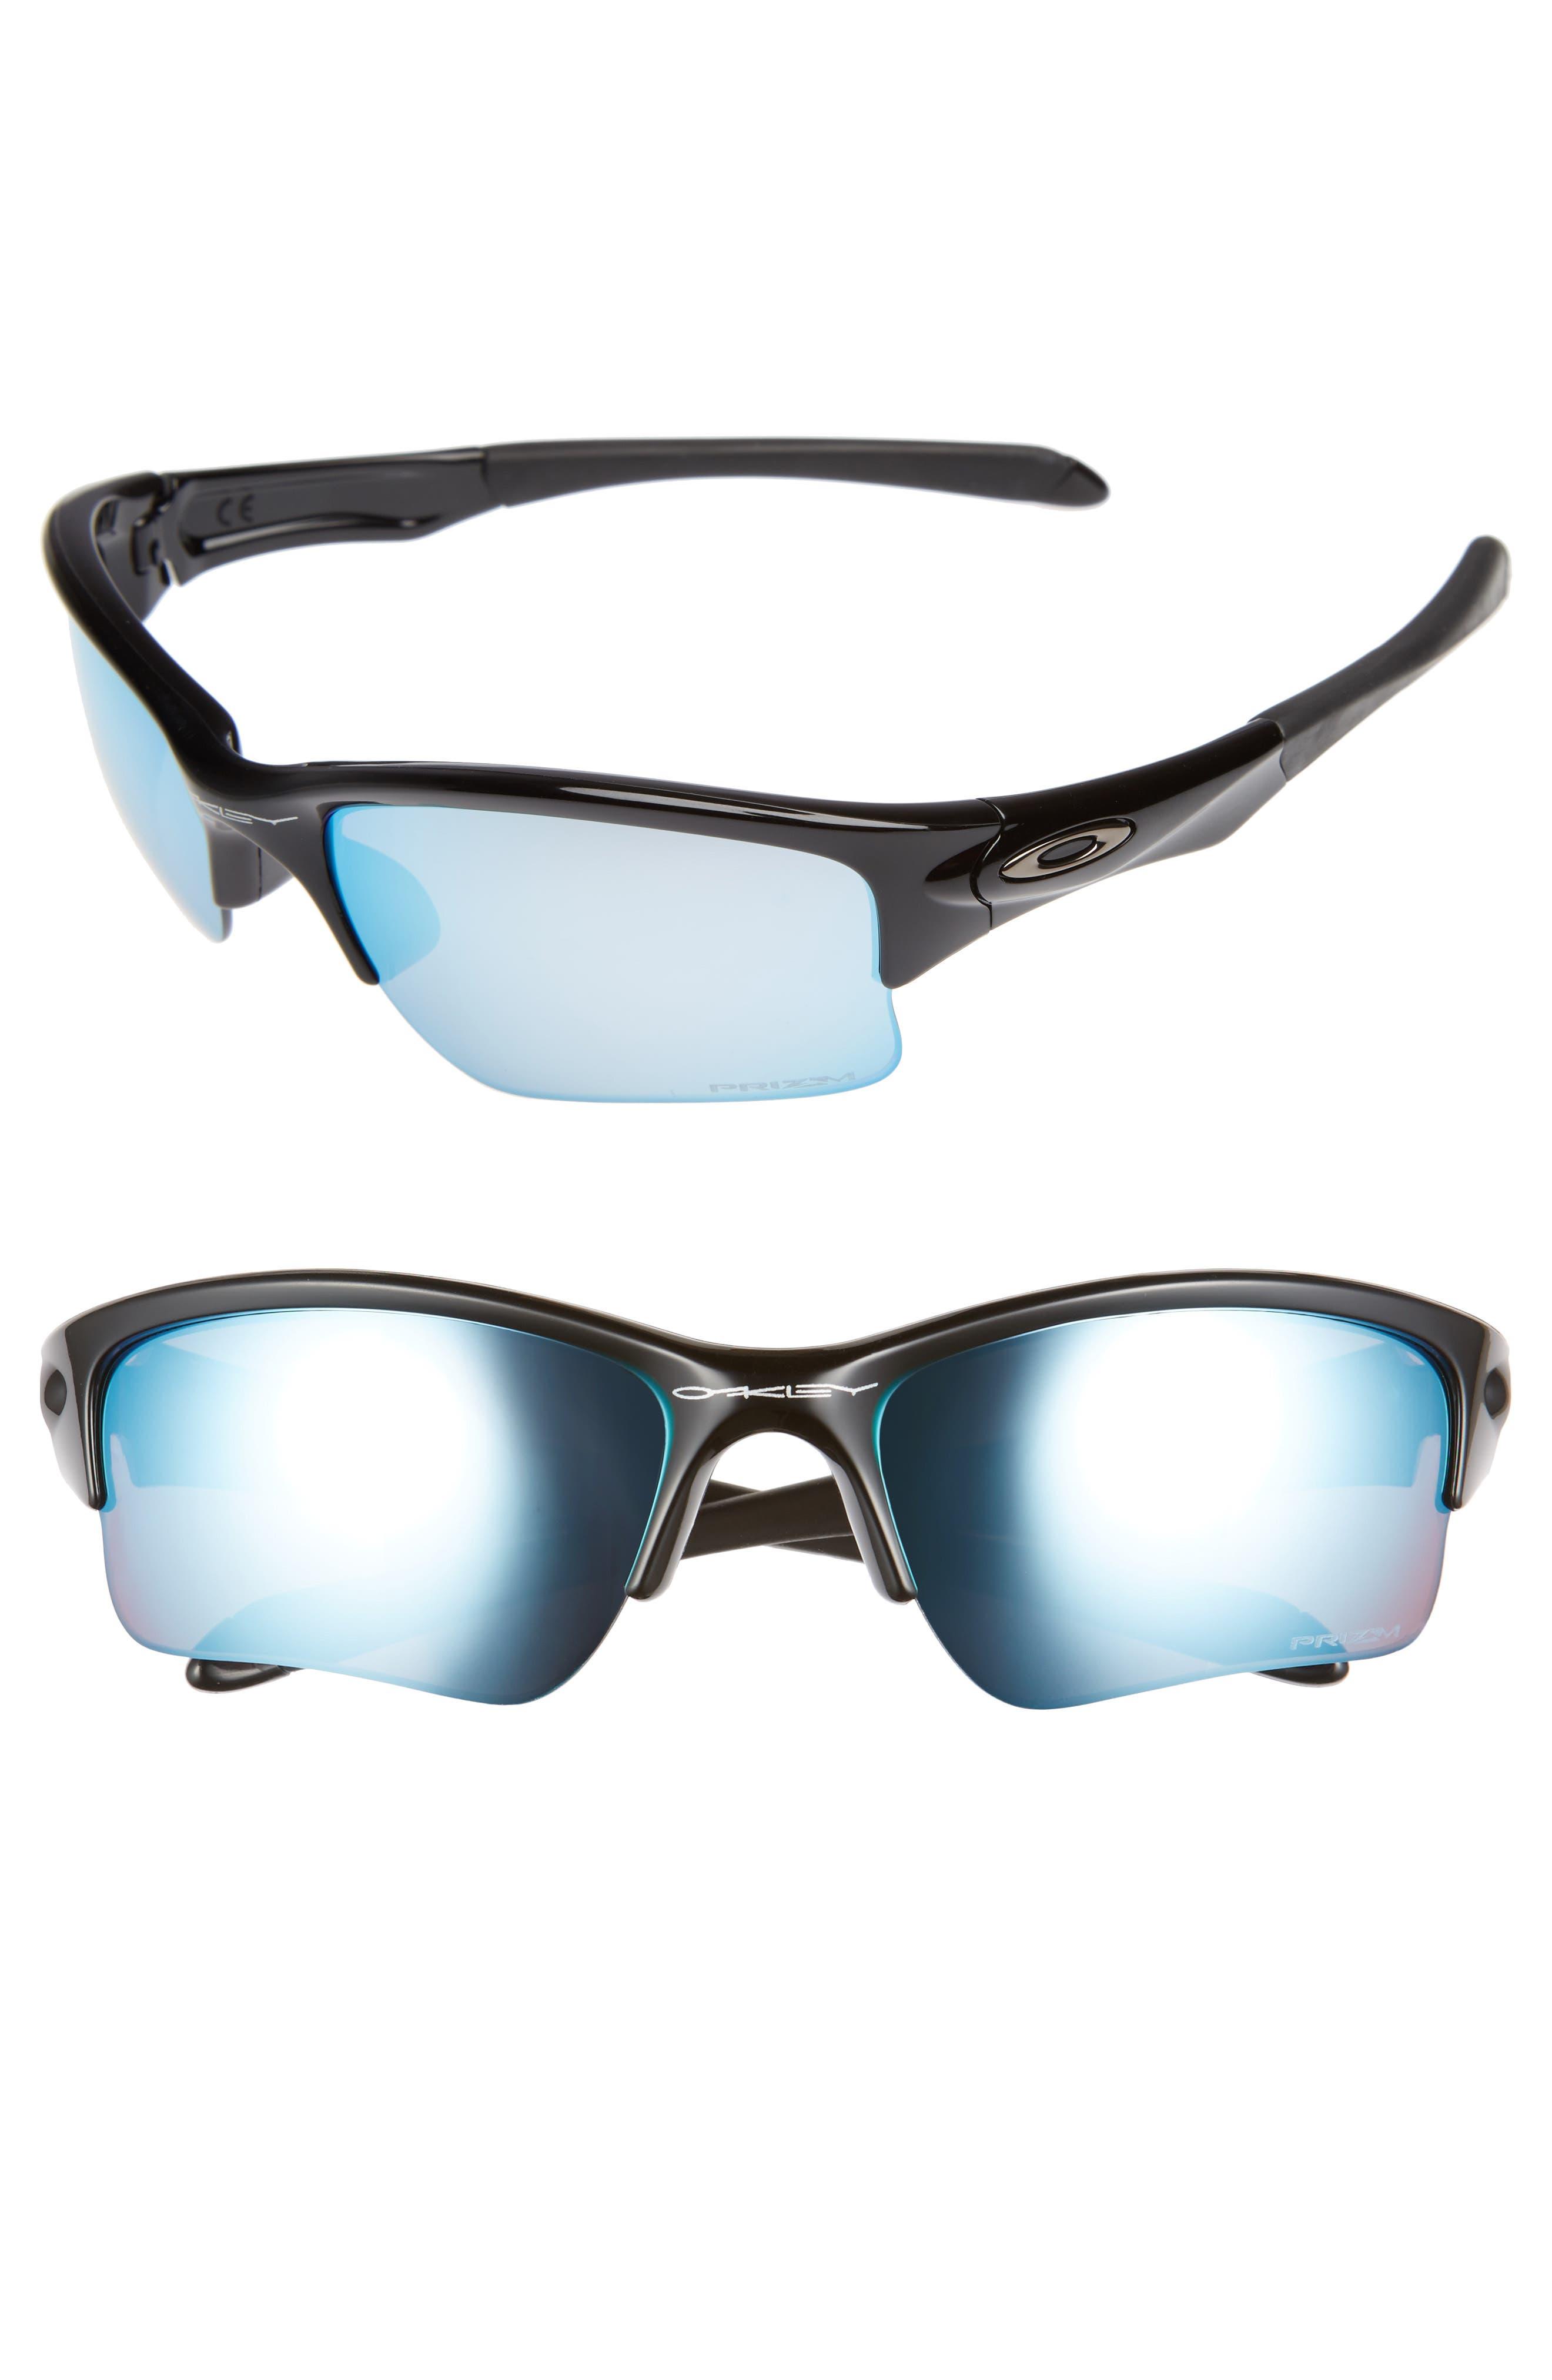 OAKLEY Quarter Jacket PRIZM<sup>™</sup> 61mm Polarized Semi-Rimless Sunglasses